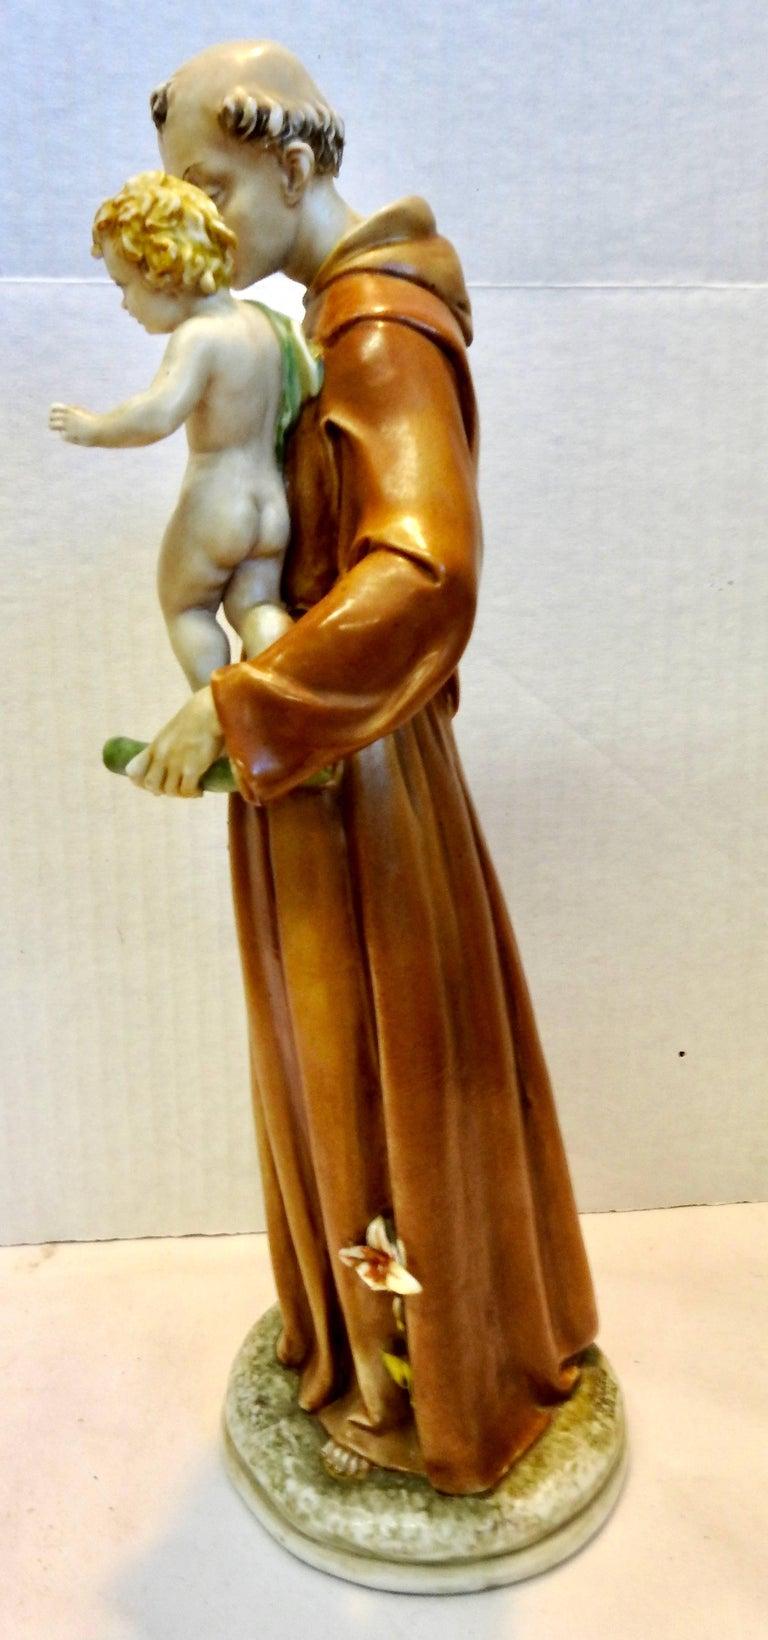 20th Century Midcentury Porcelain Saint Anthony by Antonia Borsato For Sale